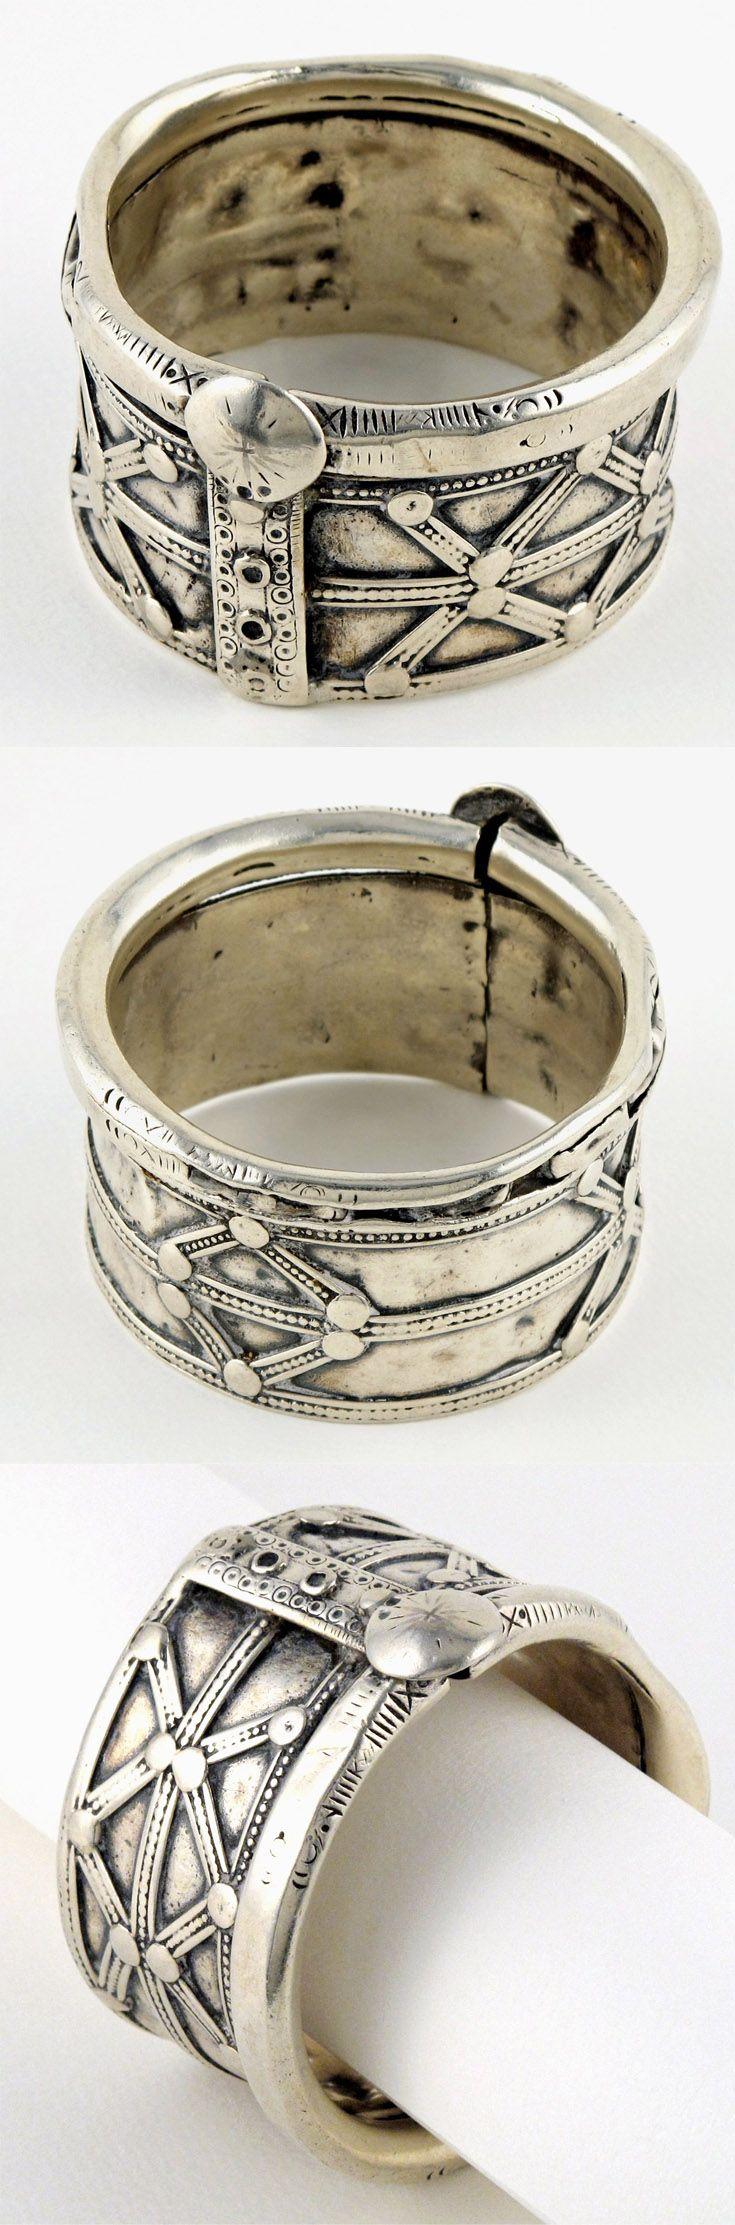 India - Rajasthan, Shekhawati region / Punjab | Heavy solid silver bracelet worn…